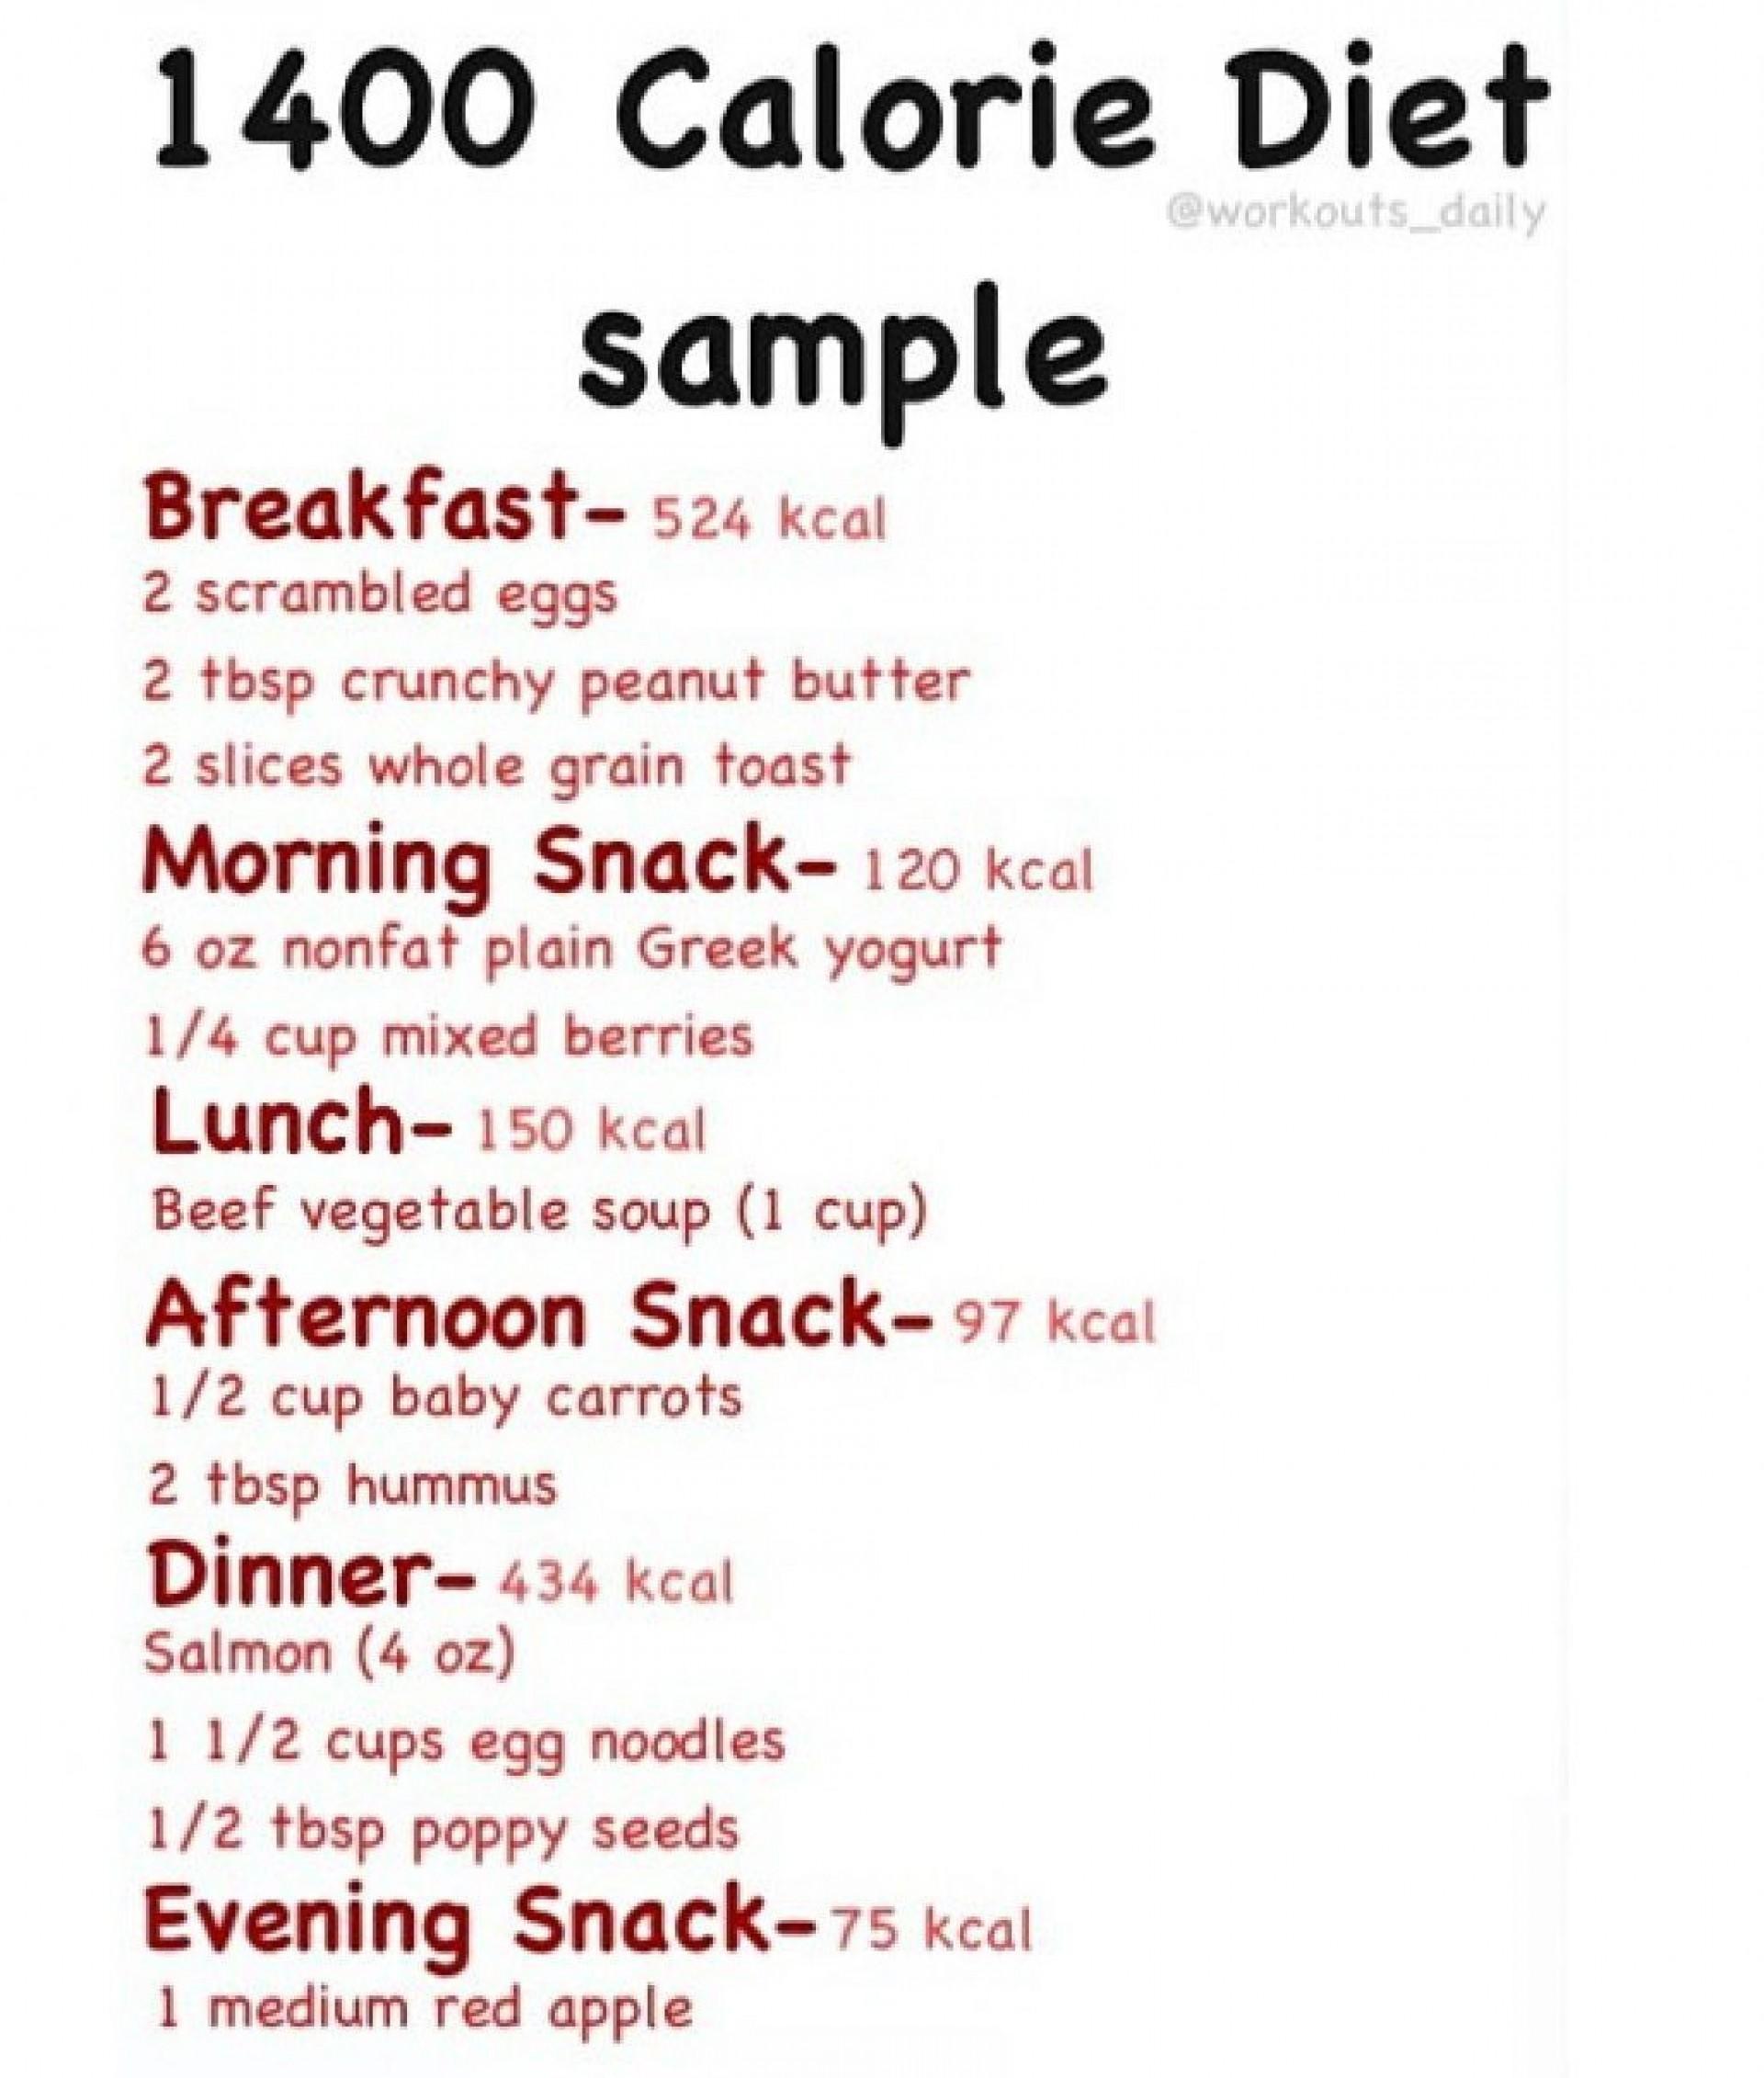 001 Incredible 1400 Calorie Sample Meal Plan Pdf Design 1920